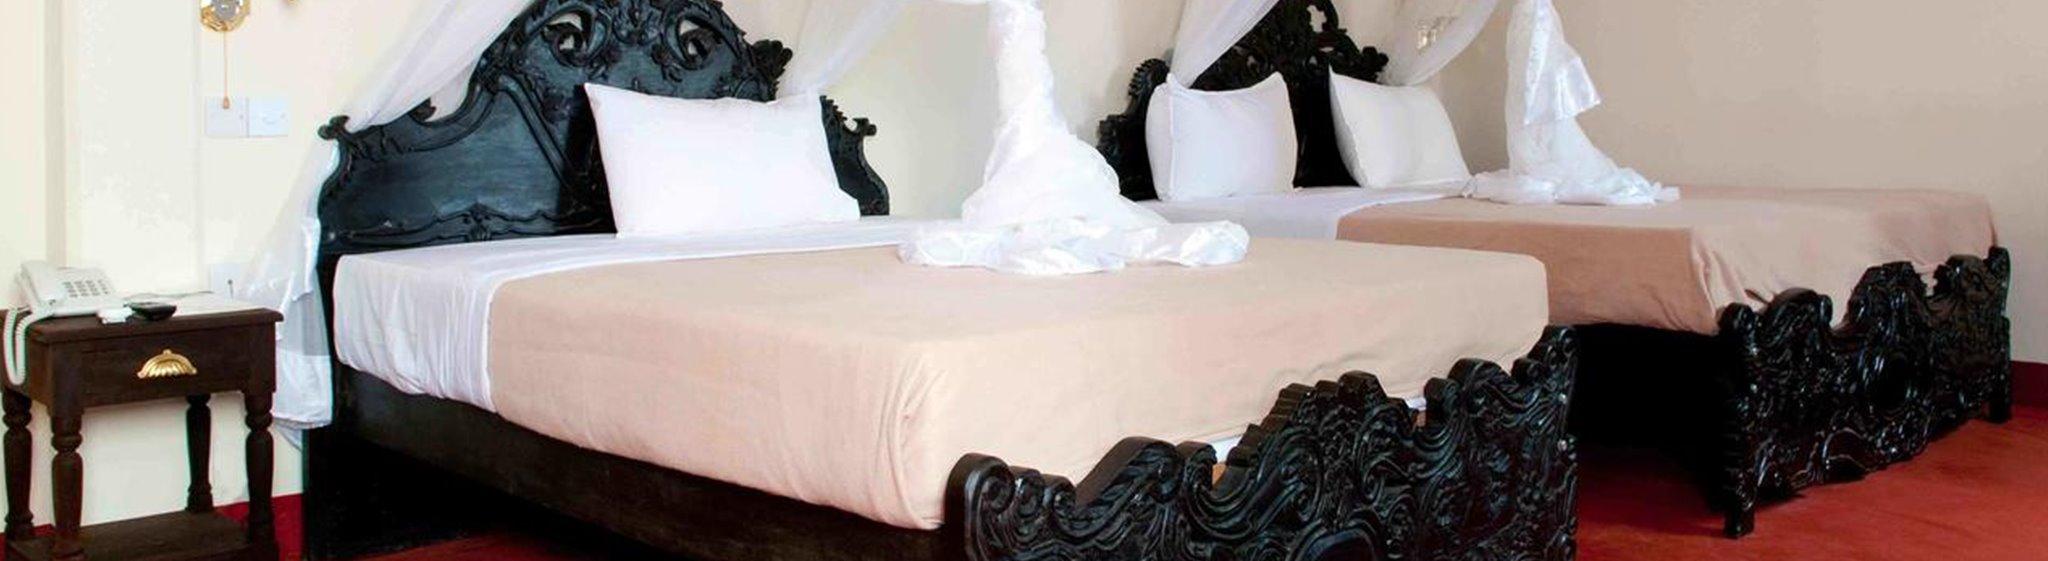 Tausi Palace Hotel - Safanta Tours & Travel Company Limited